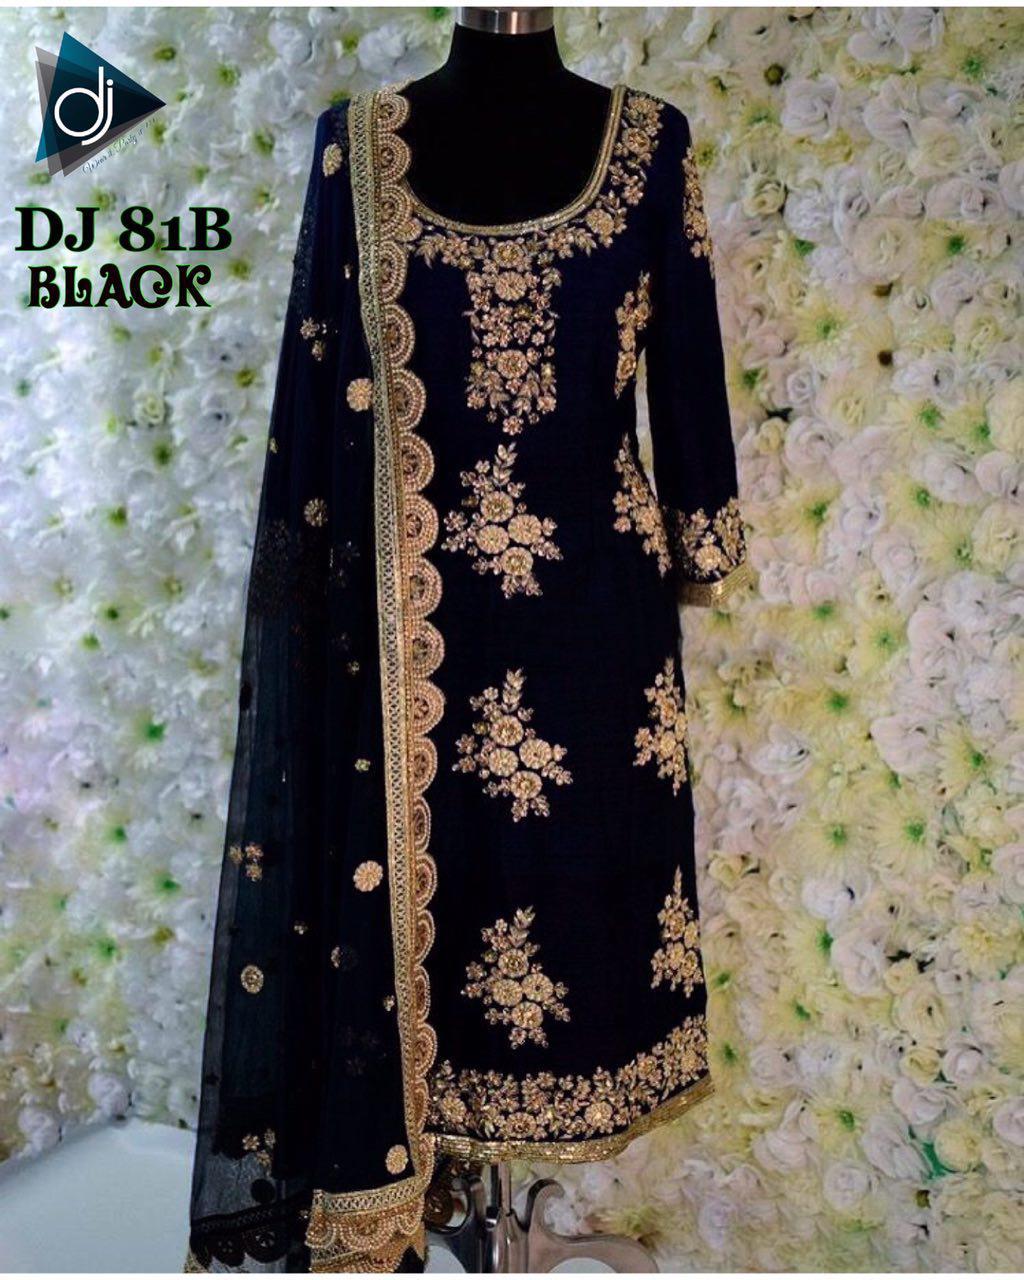 Deep Jyoti Creation DJ 81B Black